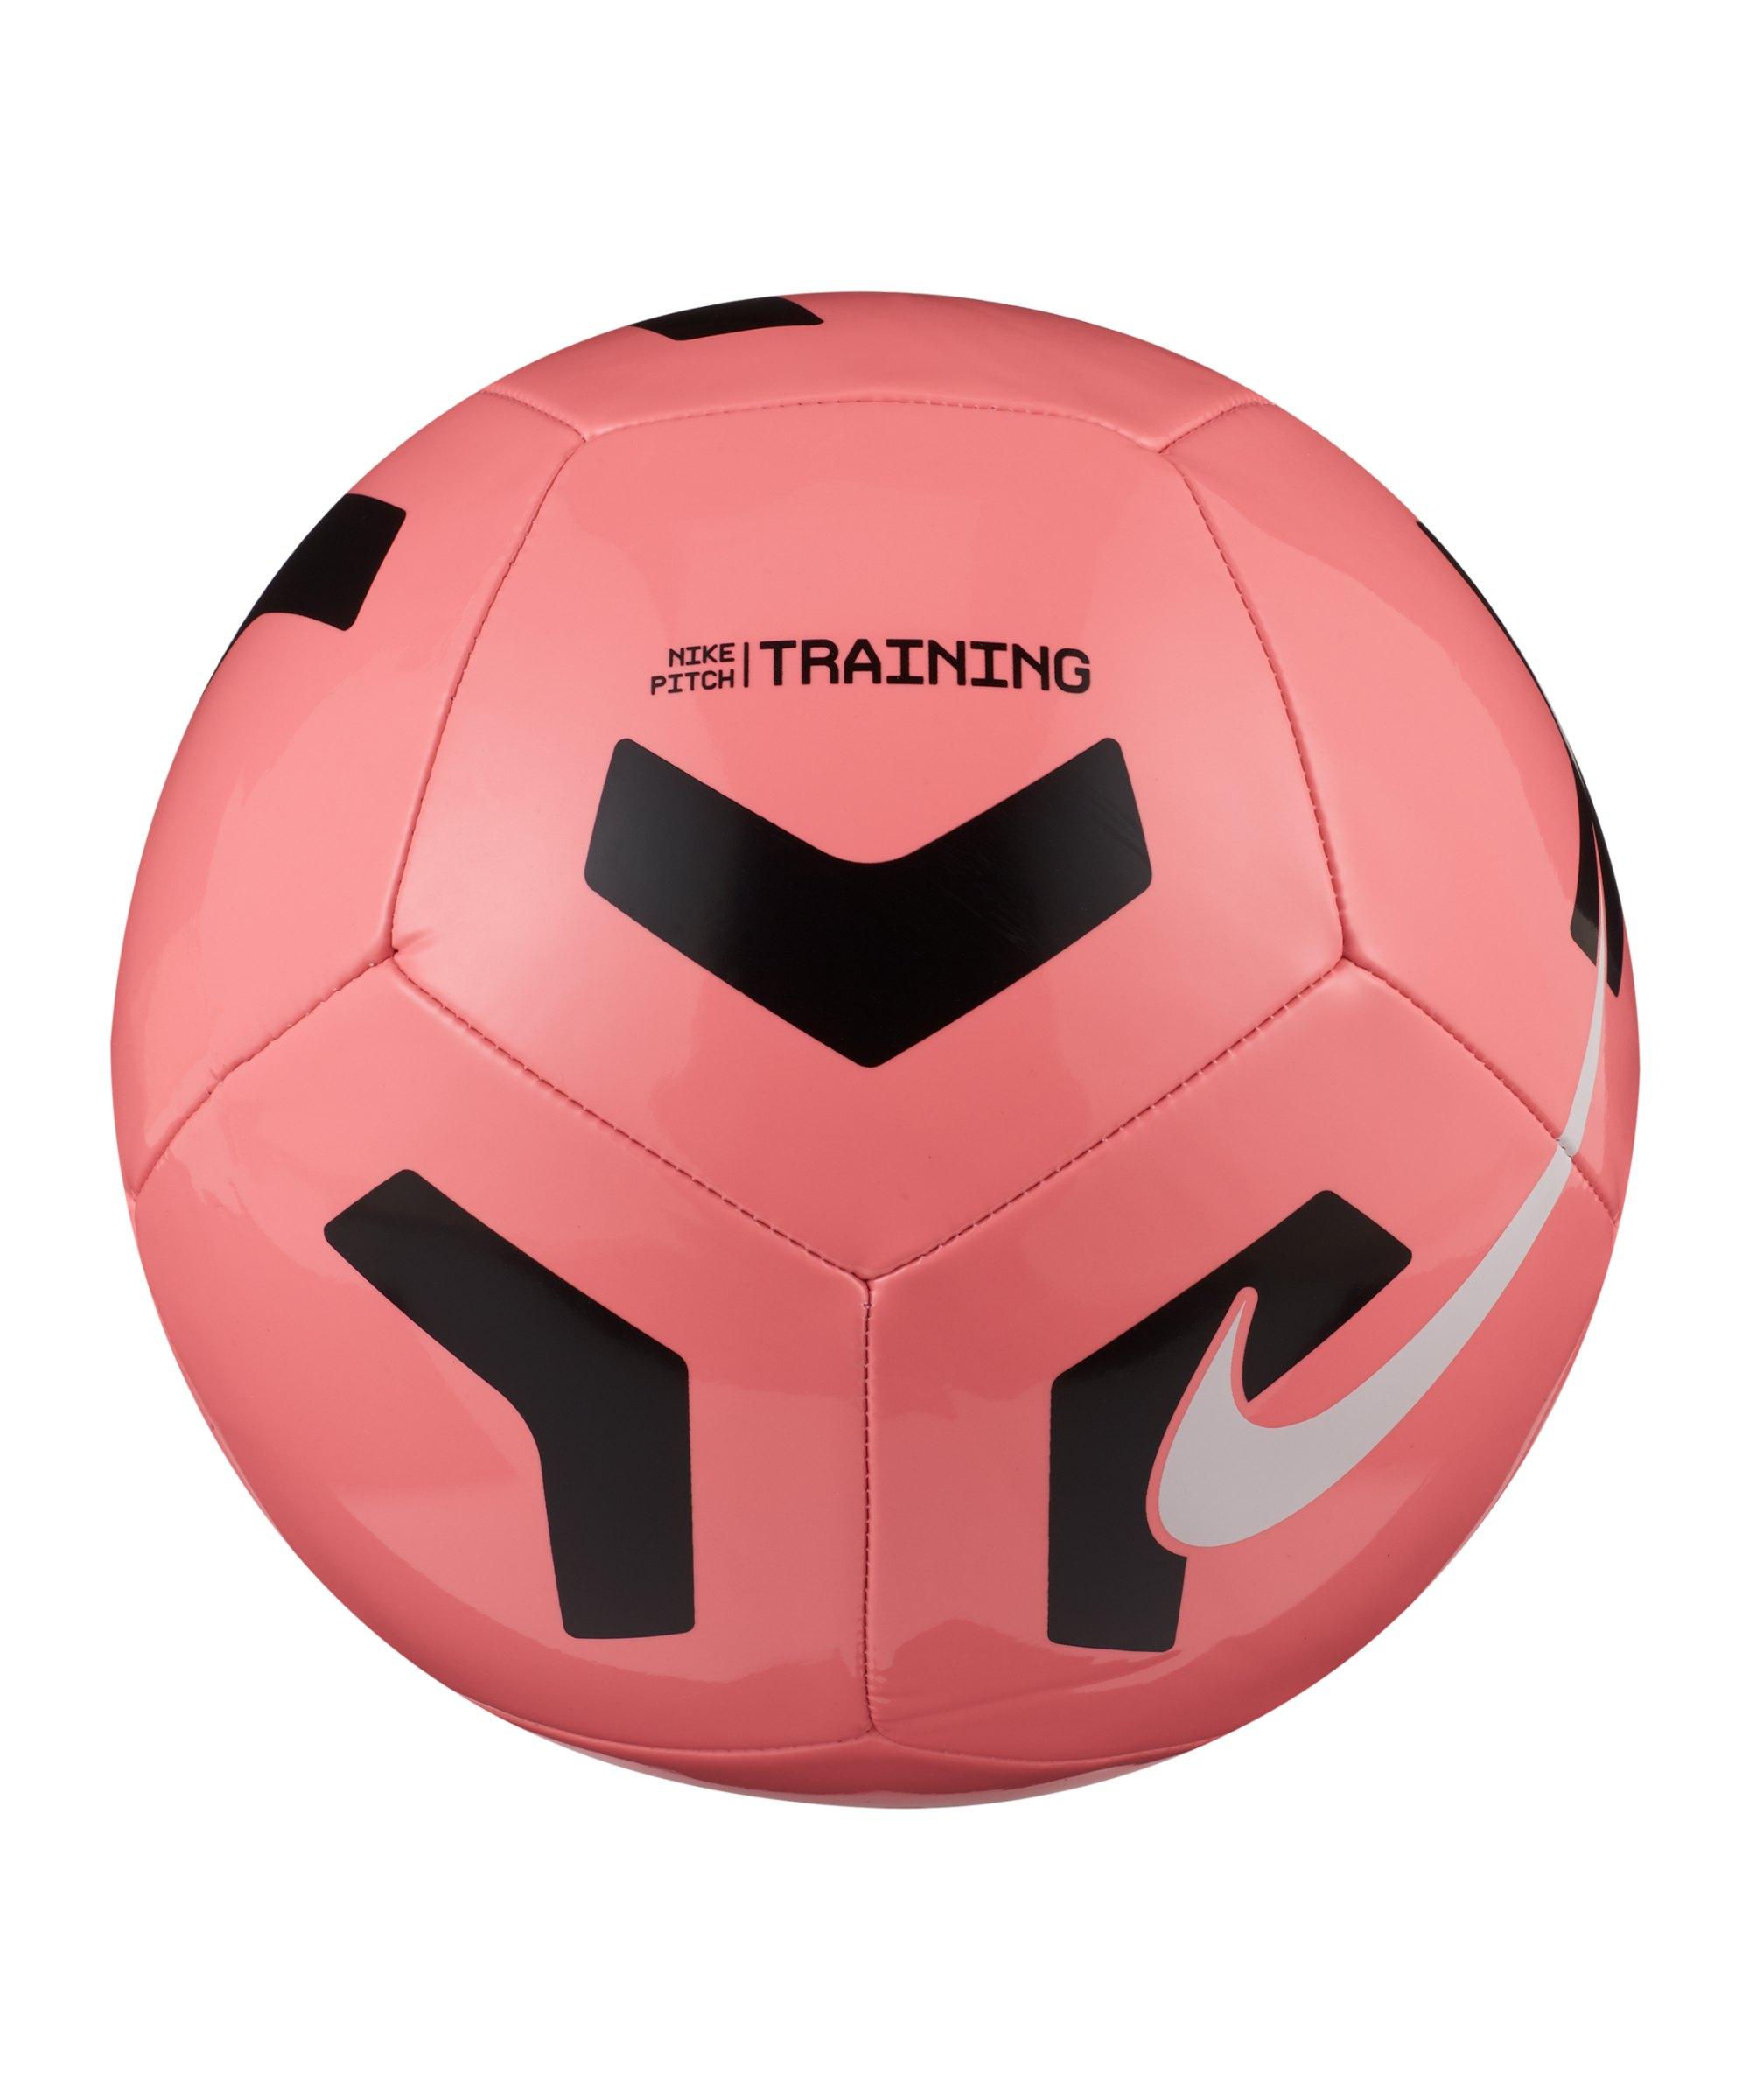 Nike Pitch Trainingsball Rot Schwarz F675 - rot